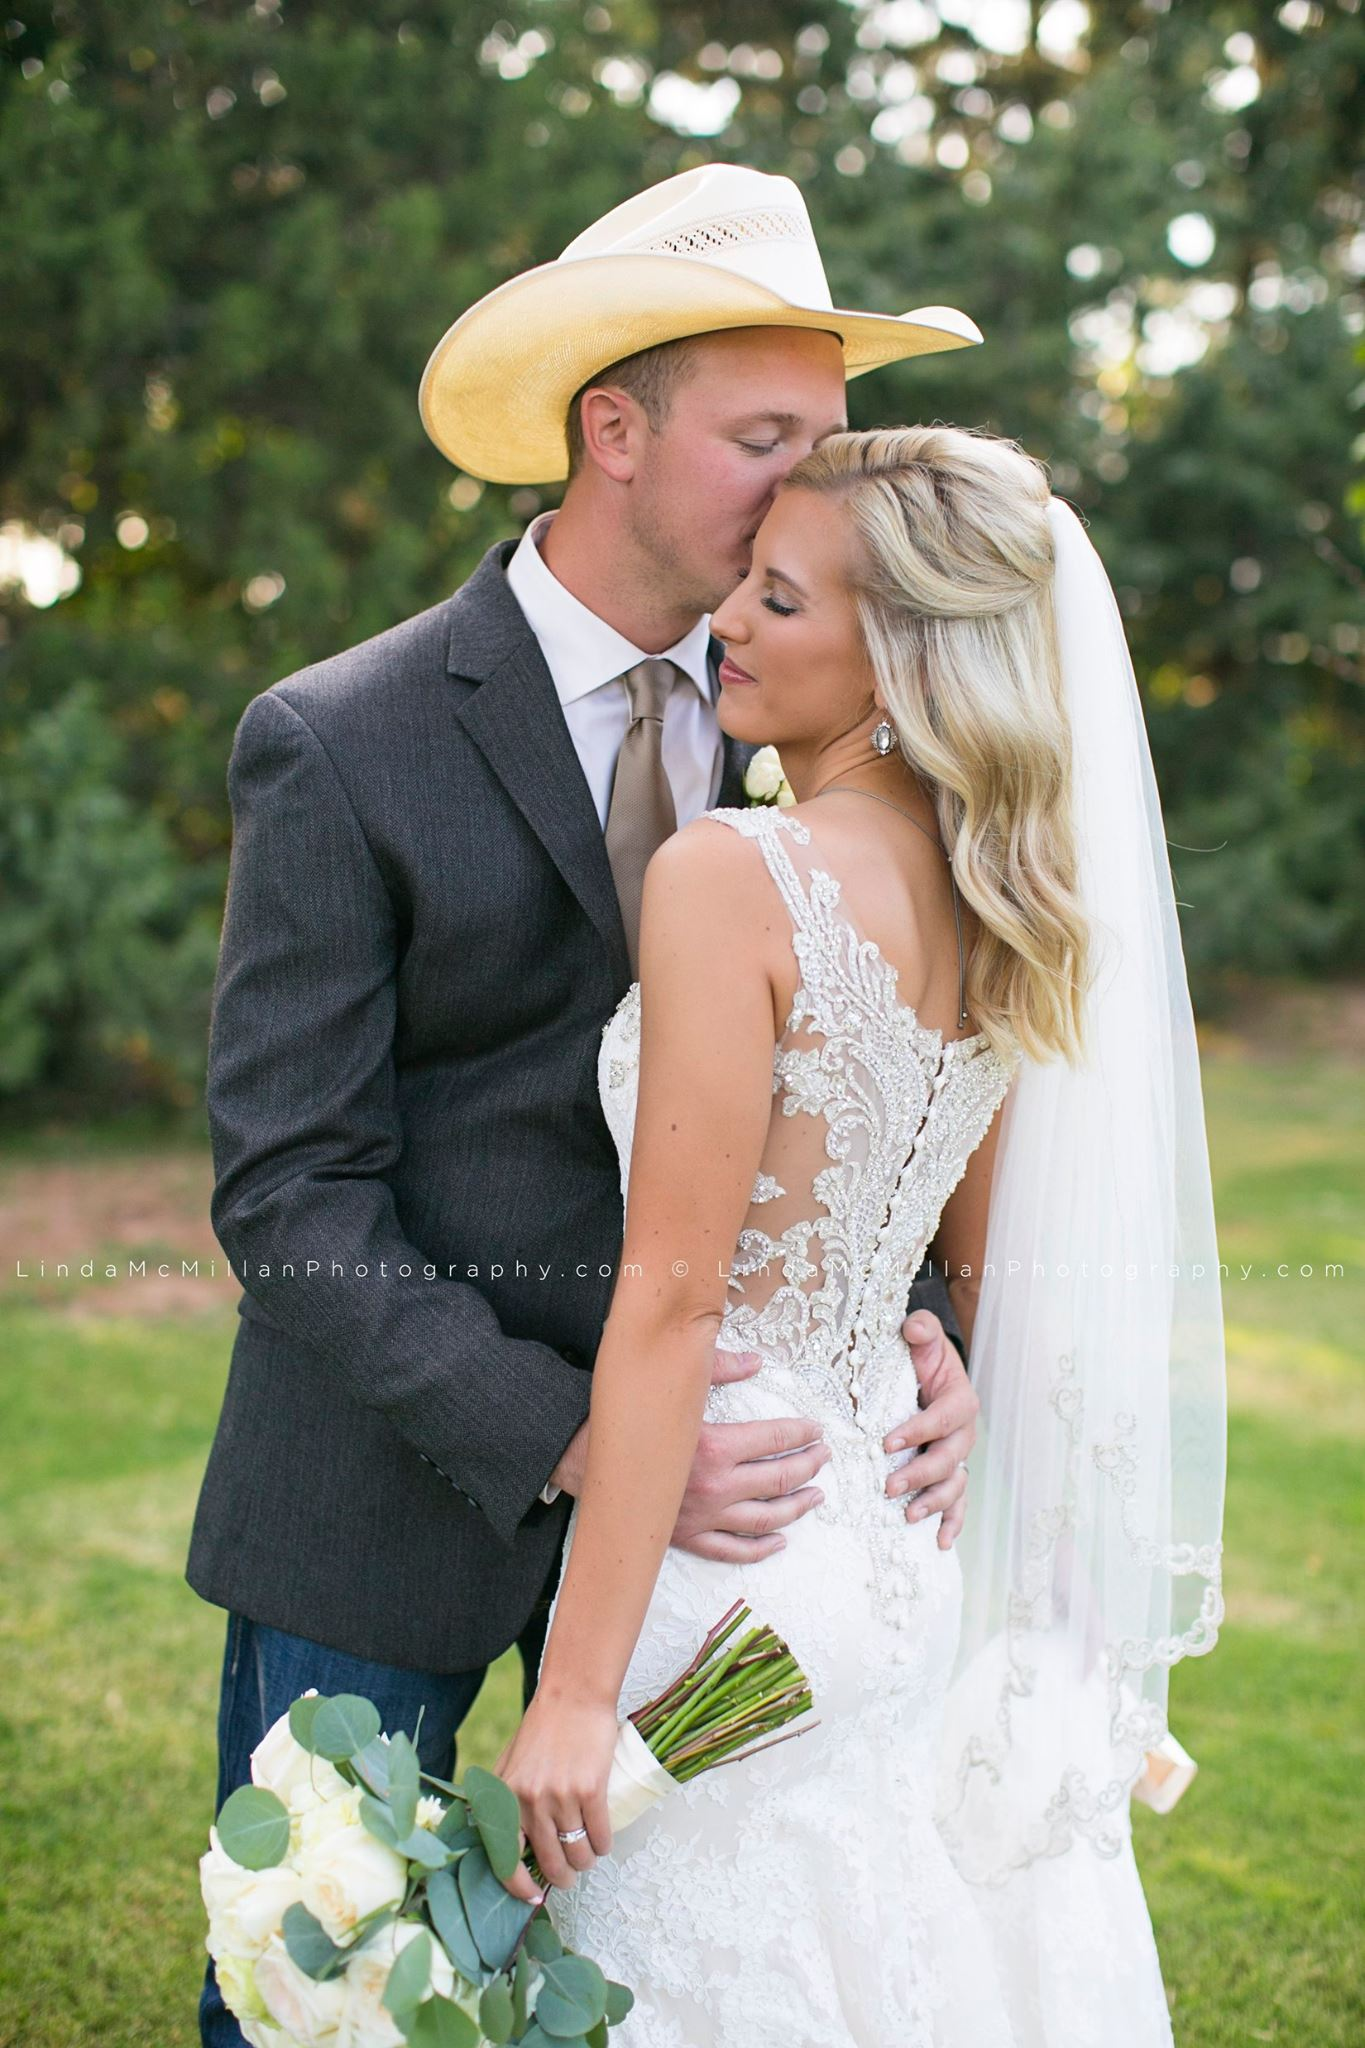 Wedding Photography by Linda Mcmillan Photography